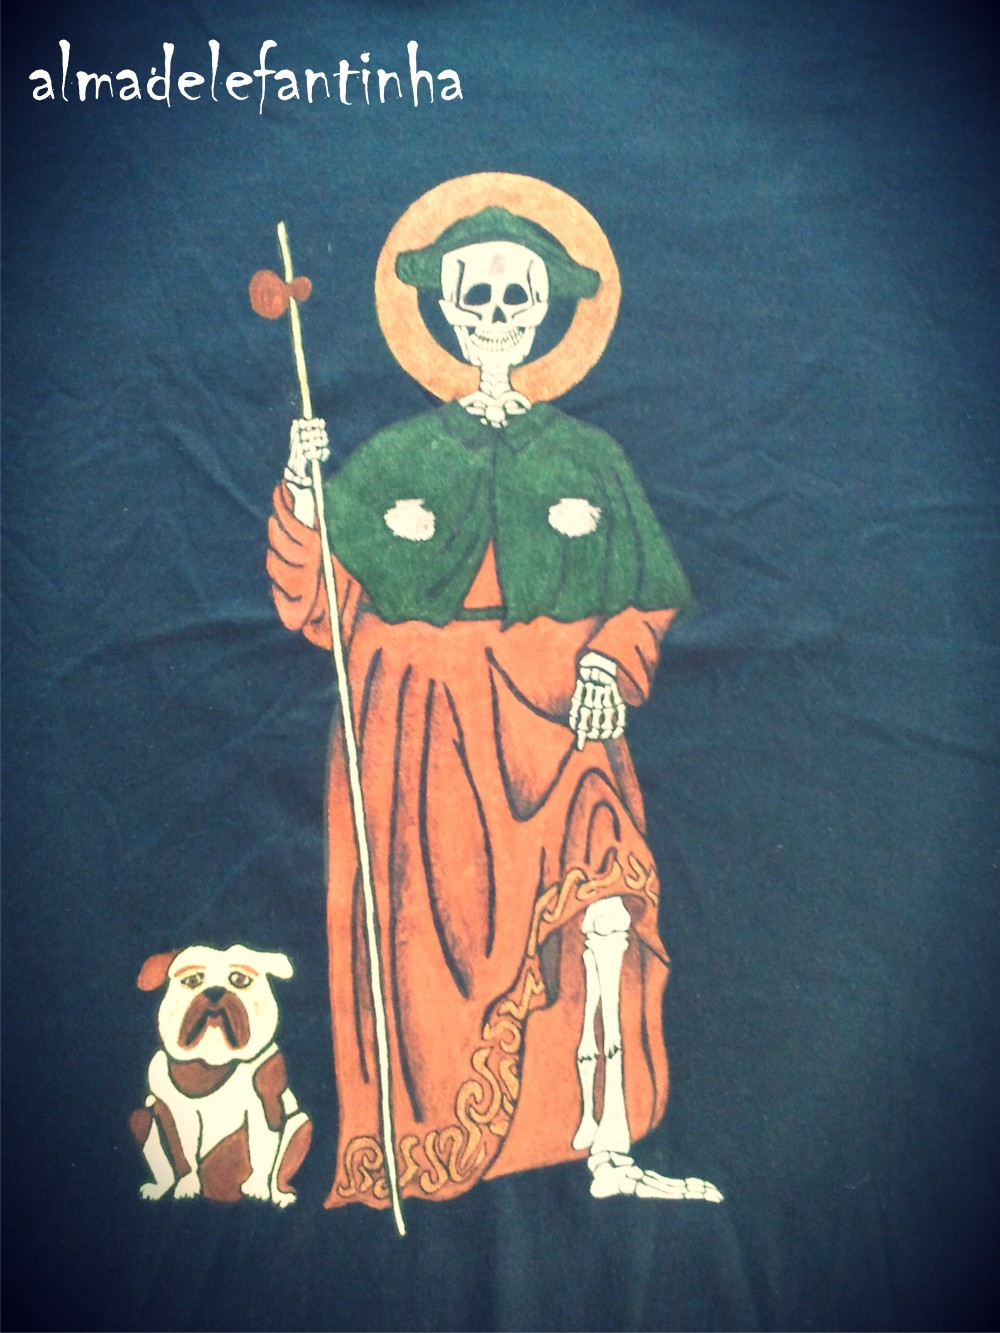 SanRoque_almadelefantinha_camisetaspintadasamano_wordpressc